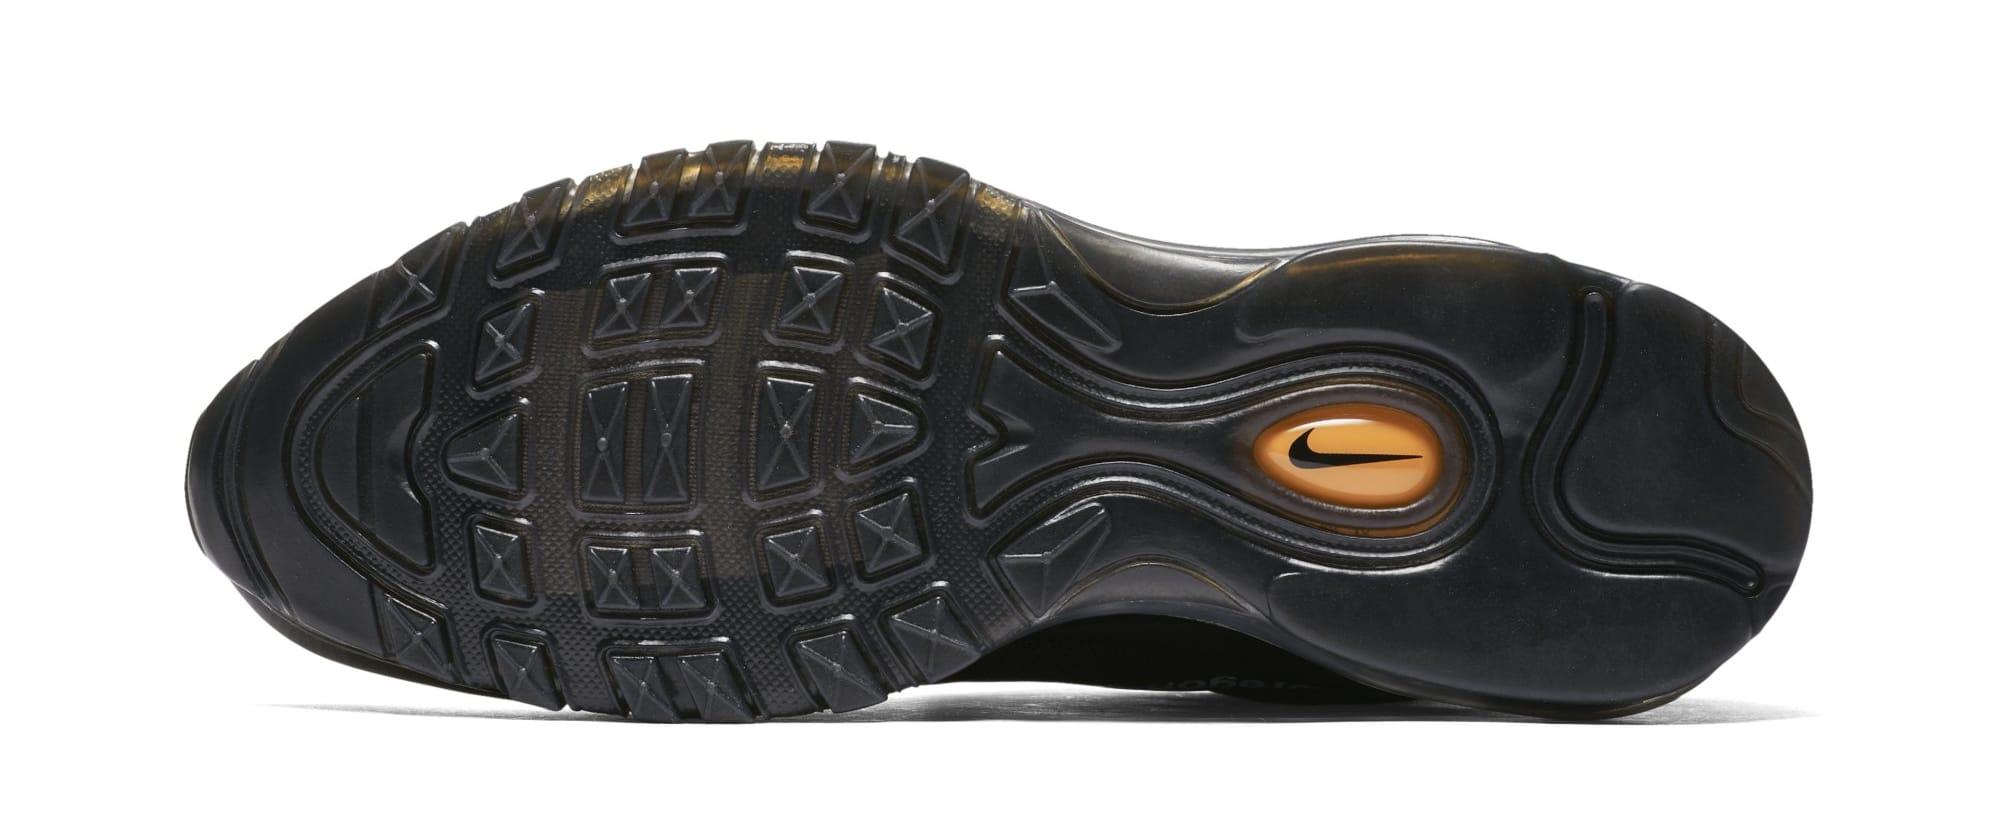 Off White Nike Air Max 97 OG AJ4585 001 Black White Cone